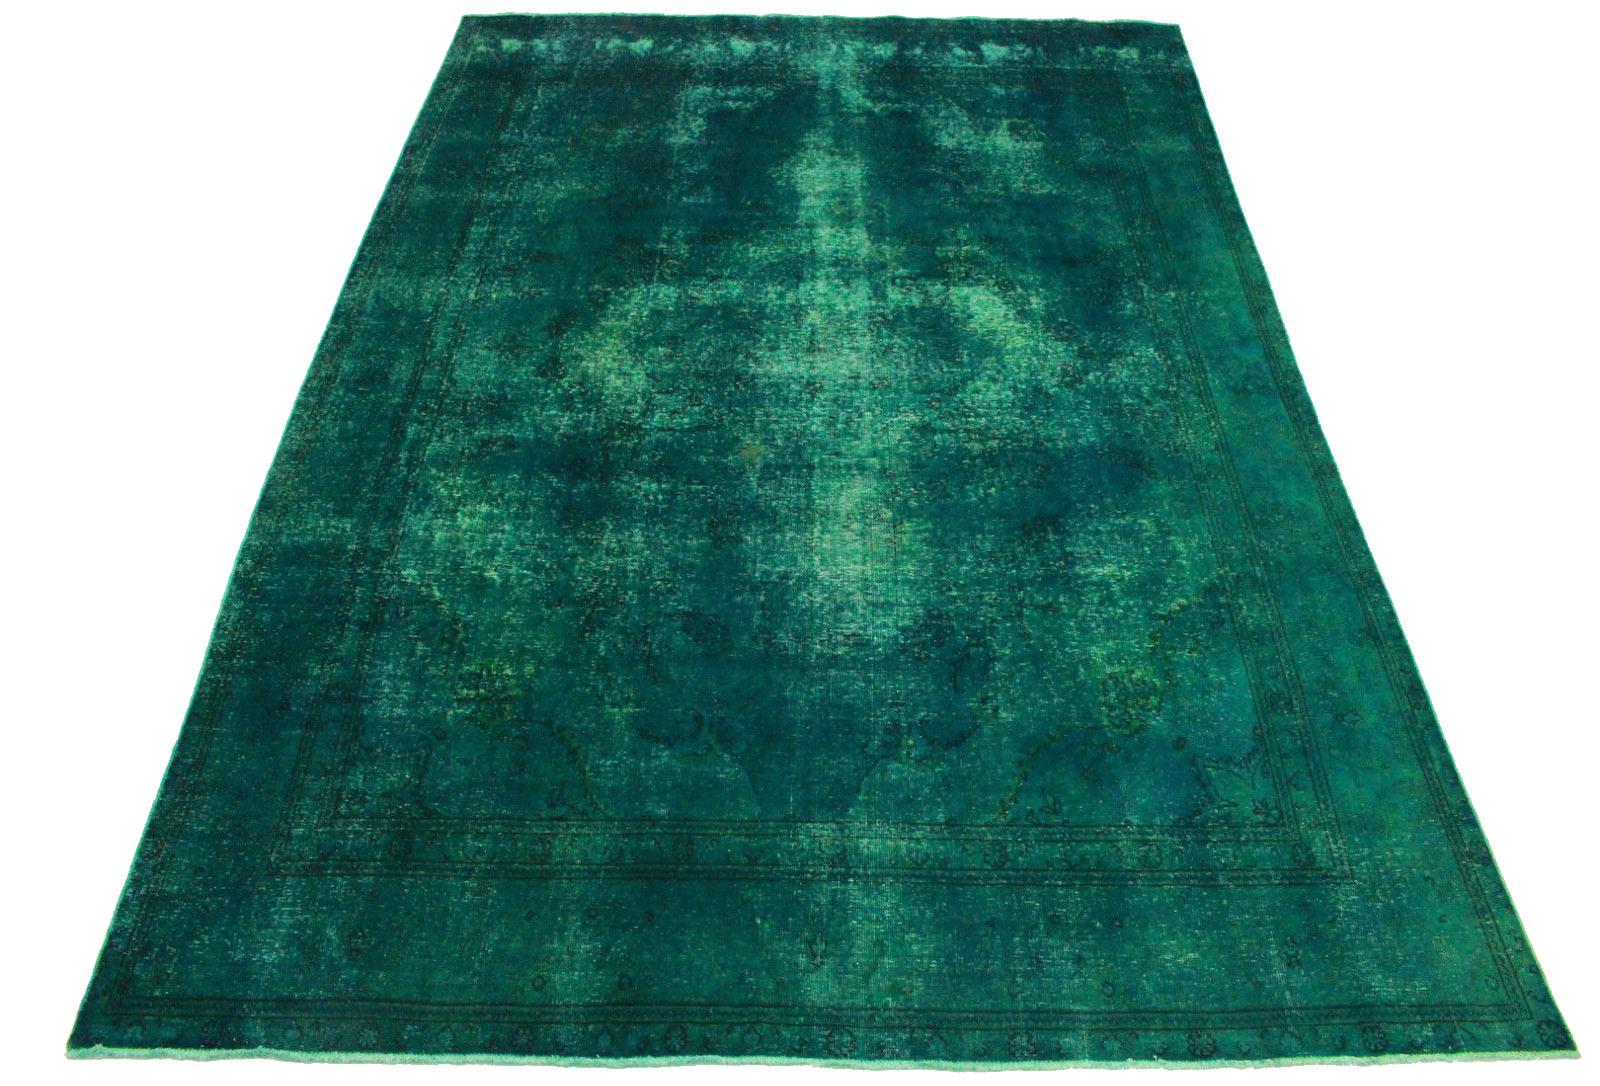 vintage teppich t rkis in 400x280cm 1001 3340 bei kaufen. Black Bedroom Furniture Sets. Home Design Ideas